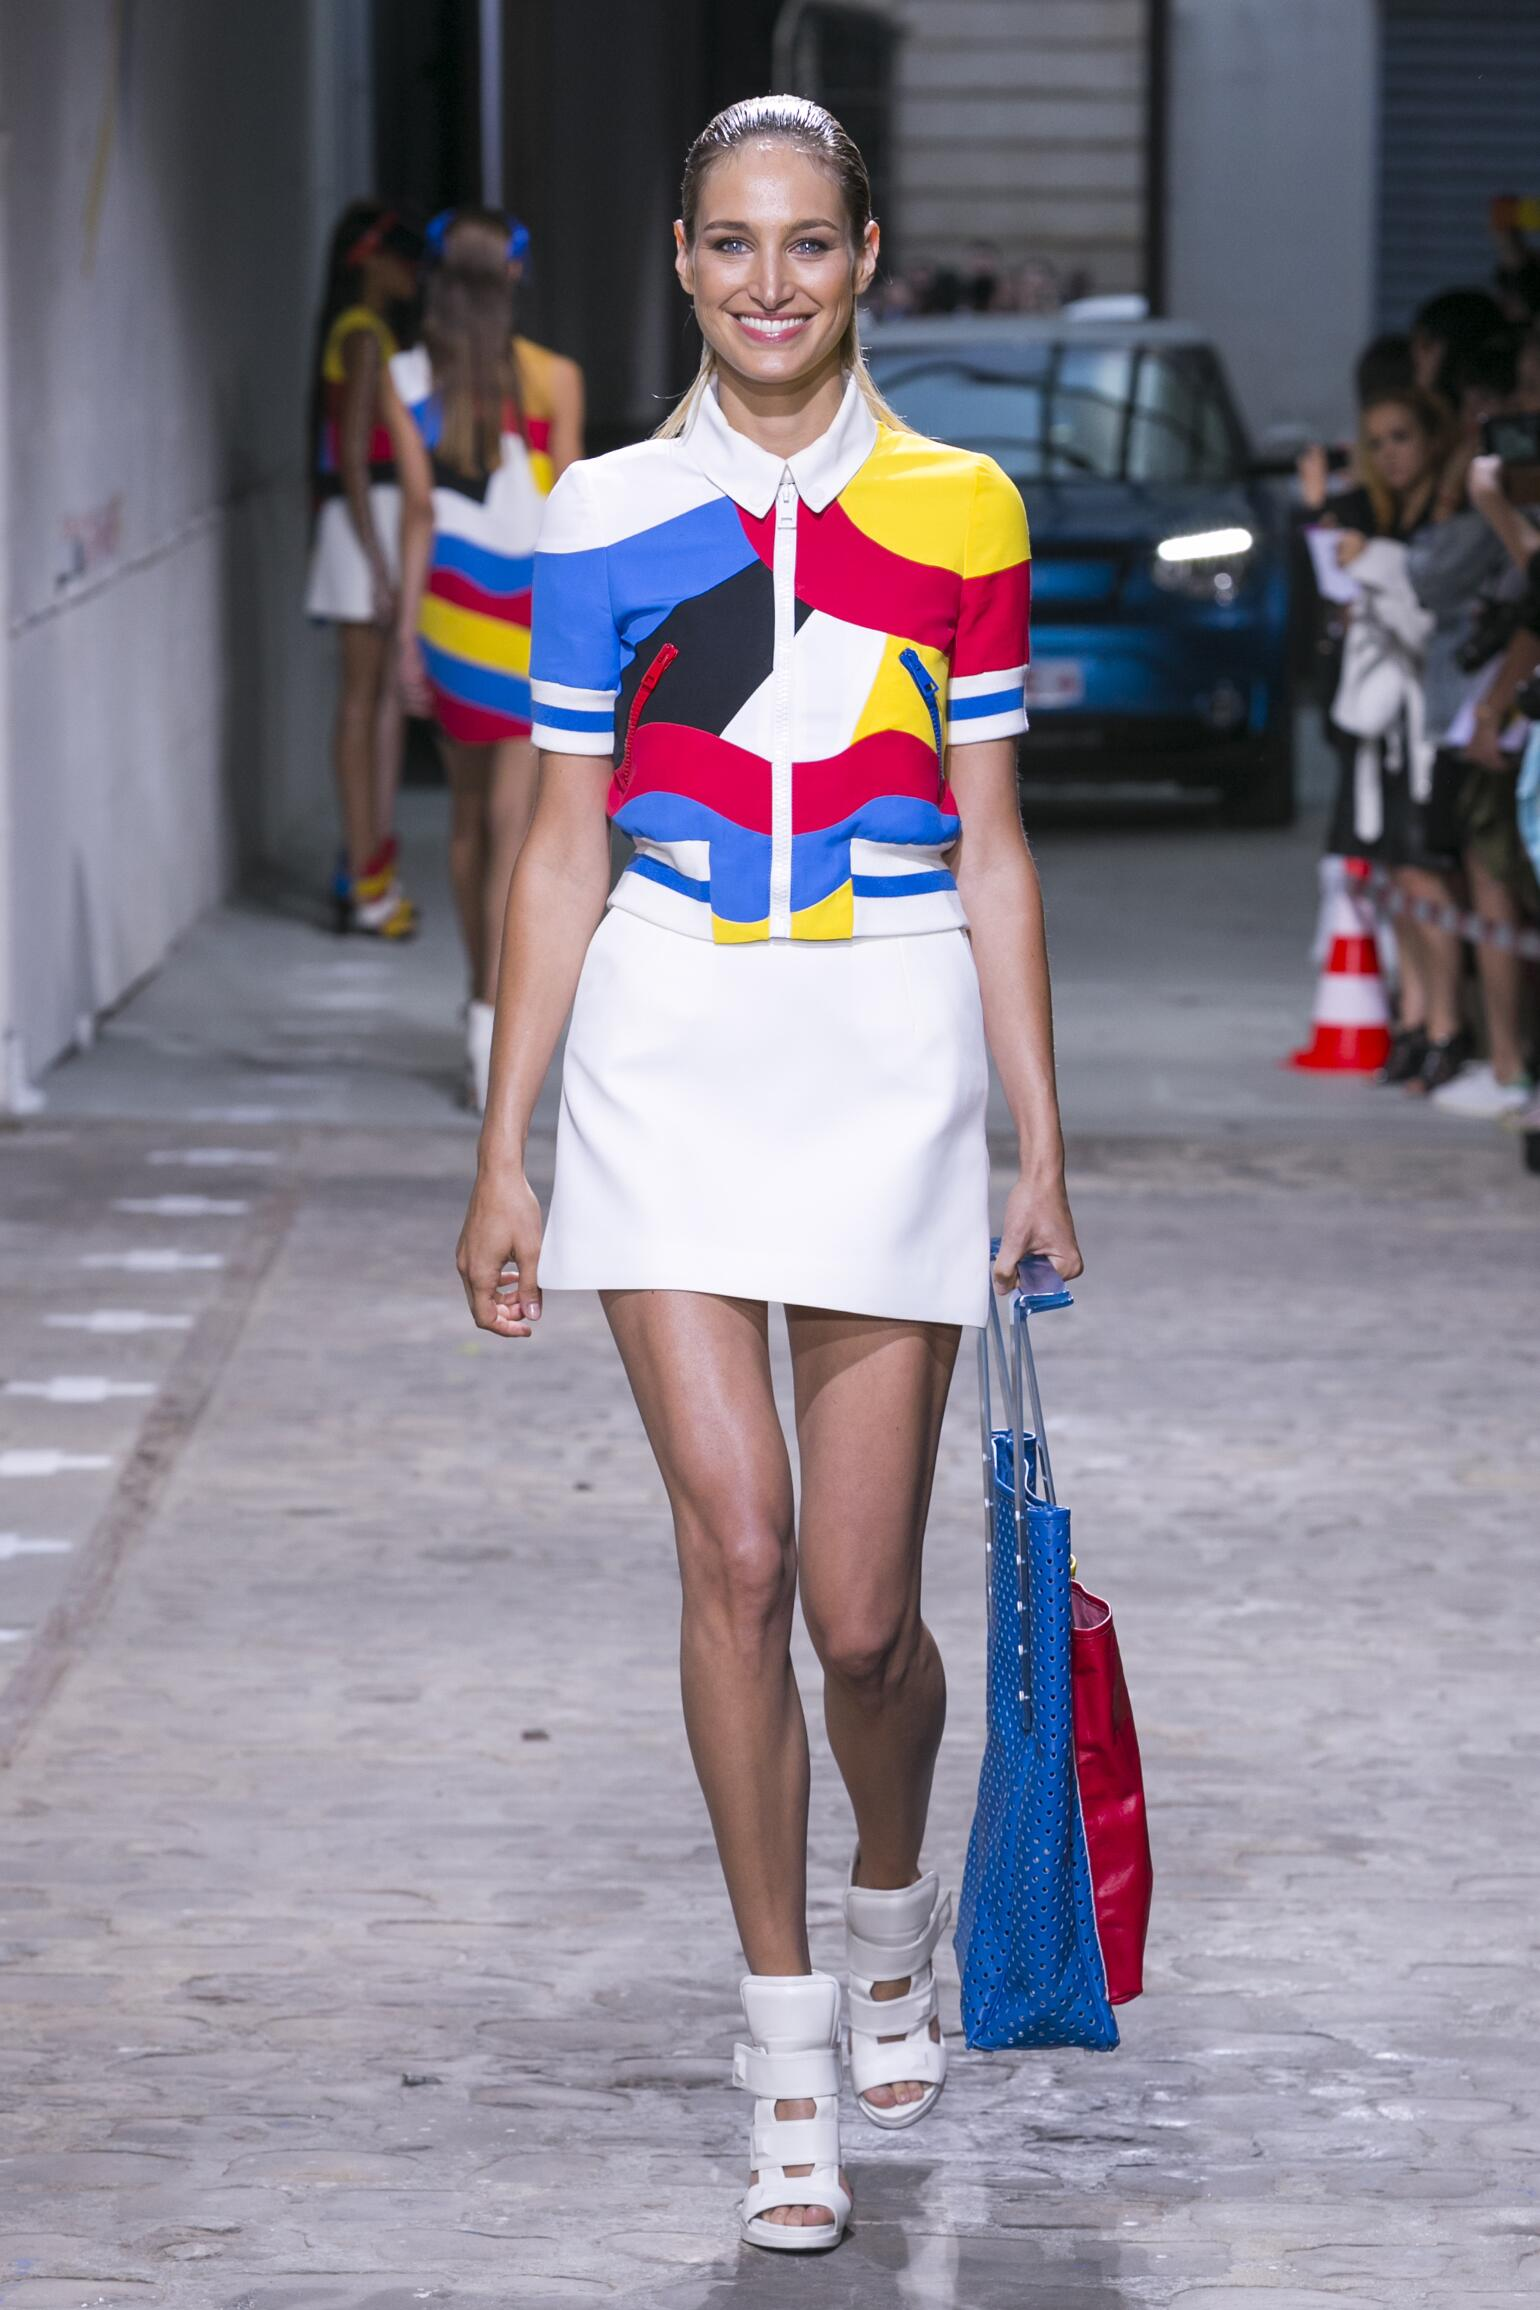 Spring Summer 2015 Fashion Model Jean-Charles de Castelbajac